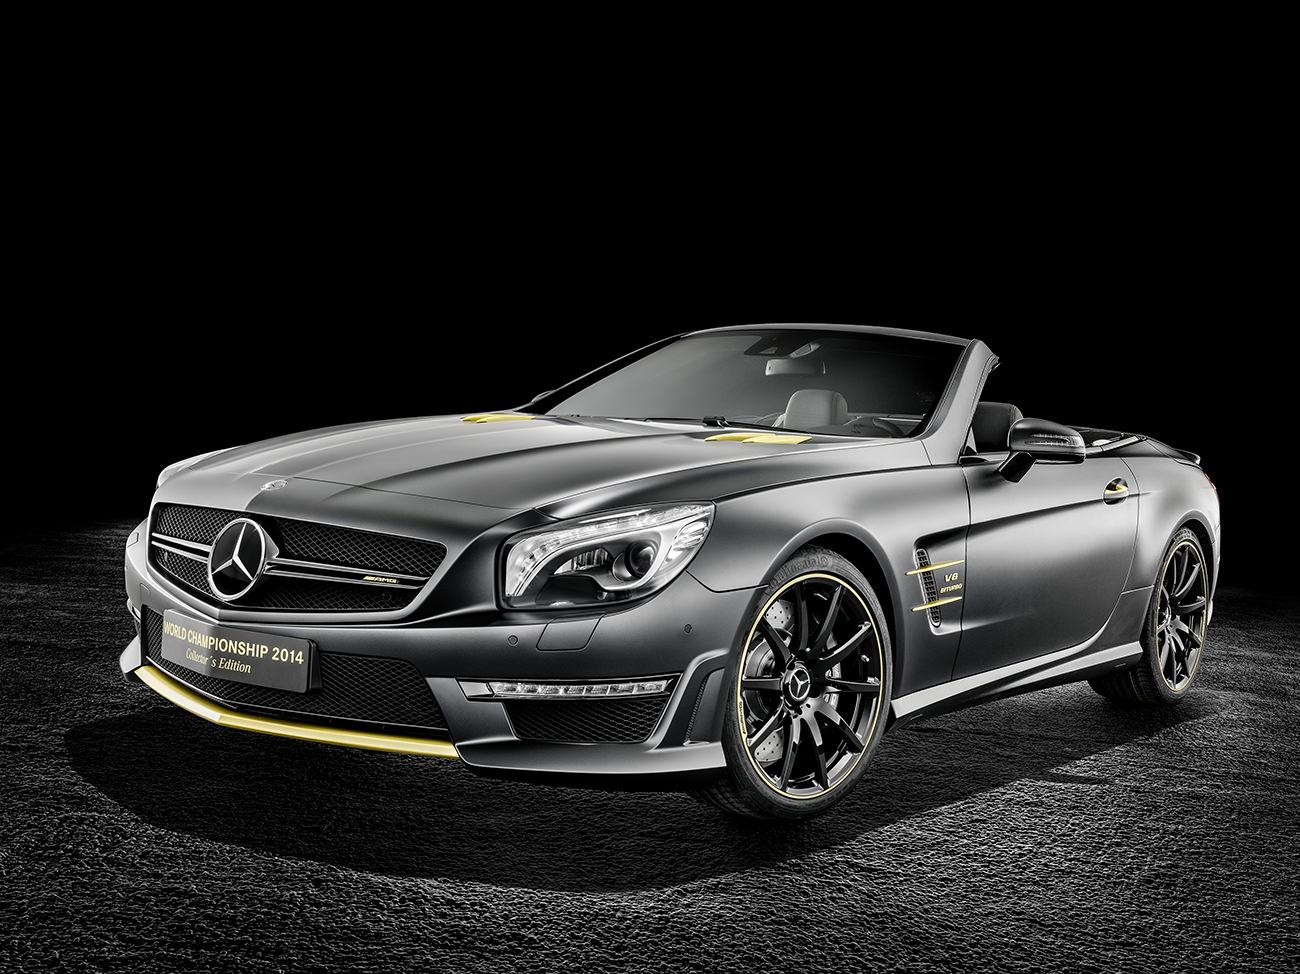 Mercedes-Benz-World-Championship-2014-Collector-Edition-1